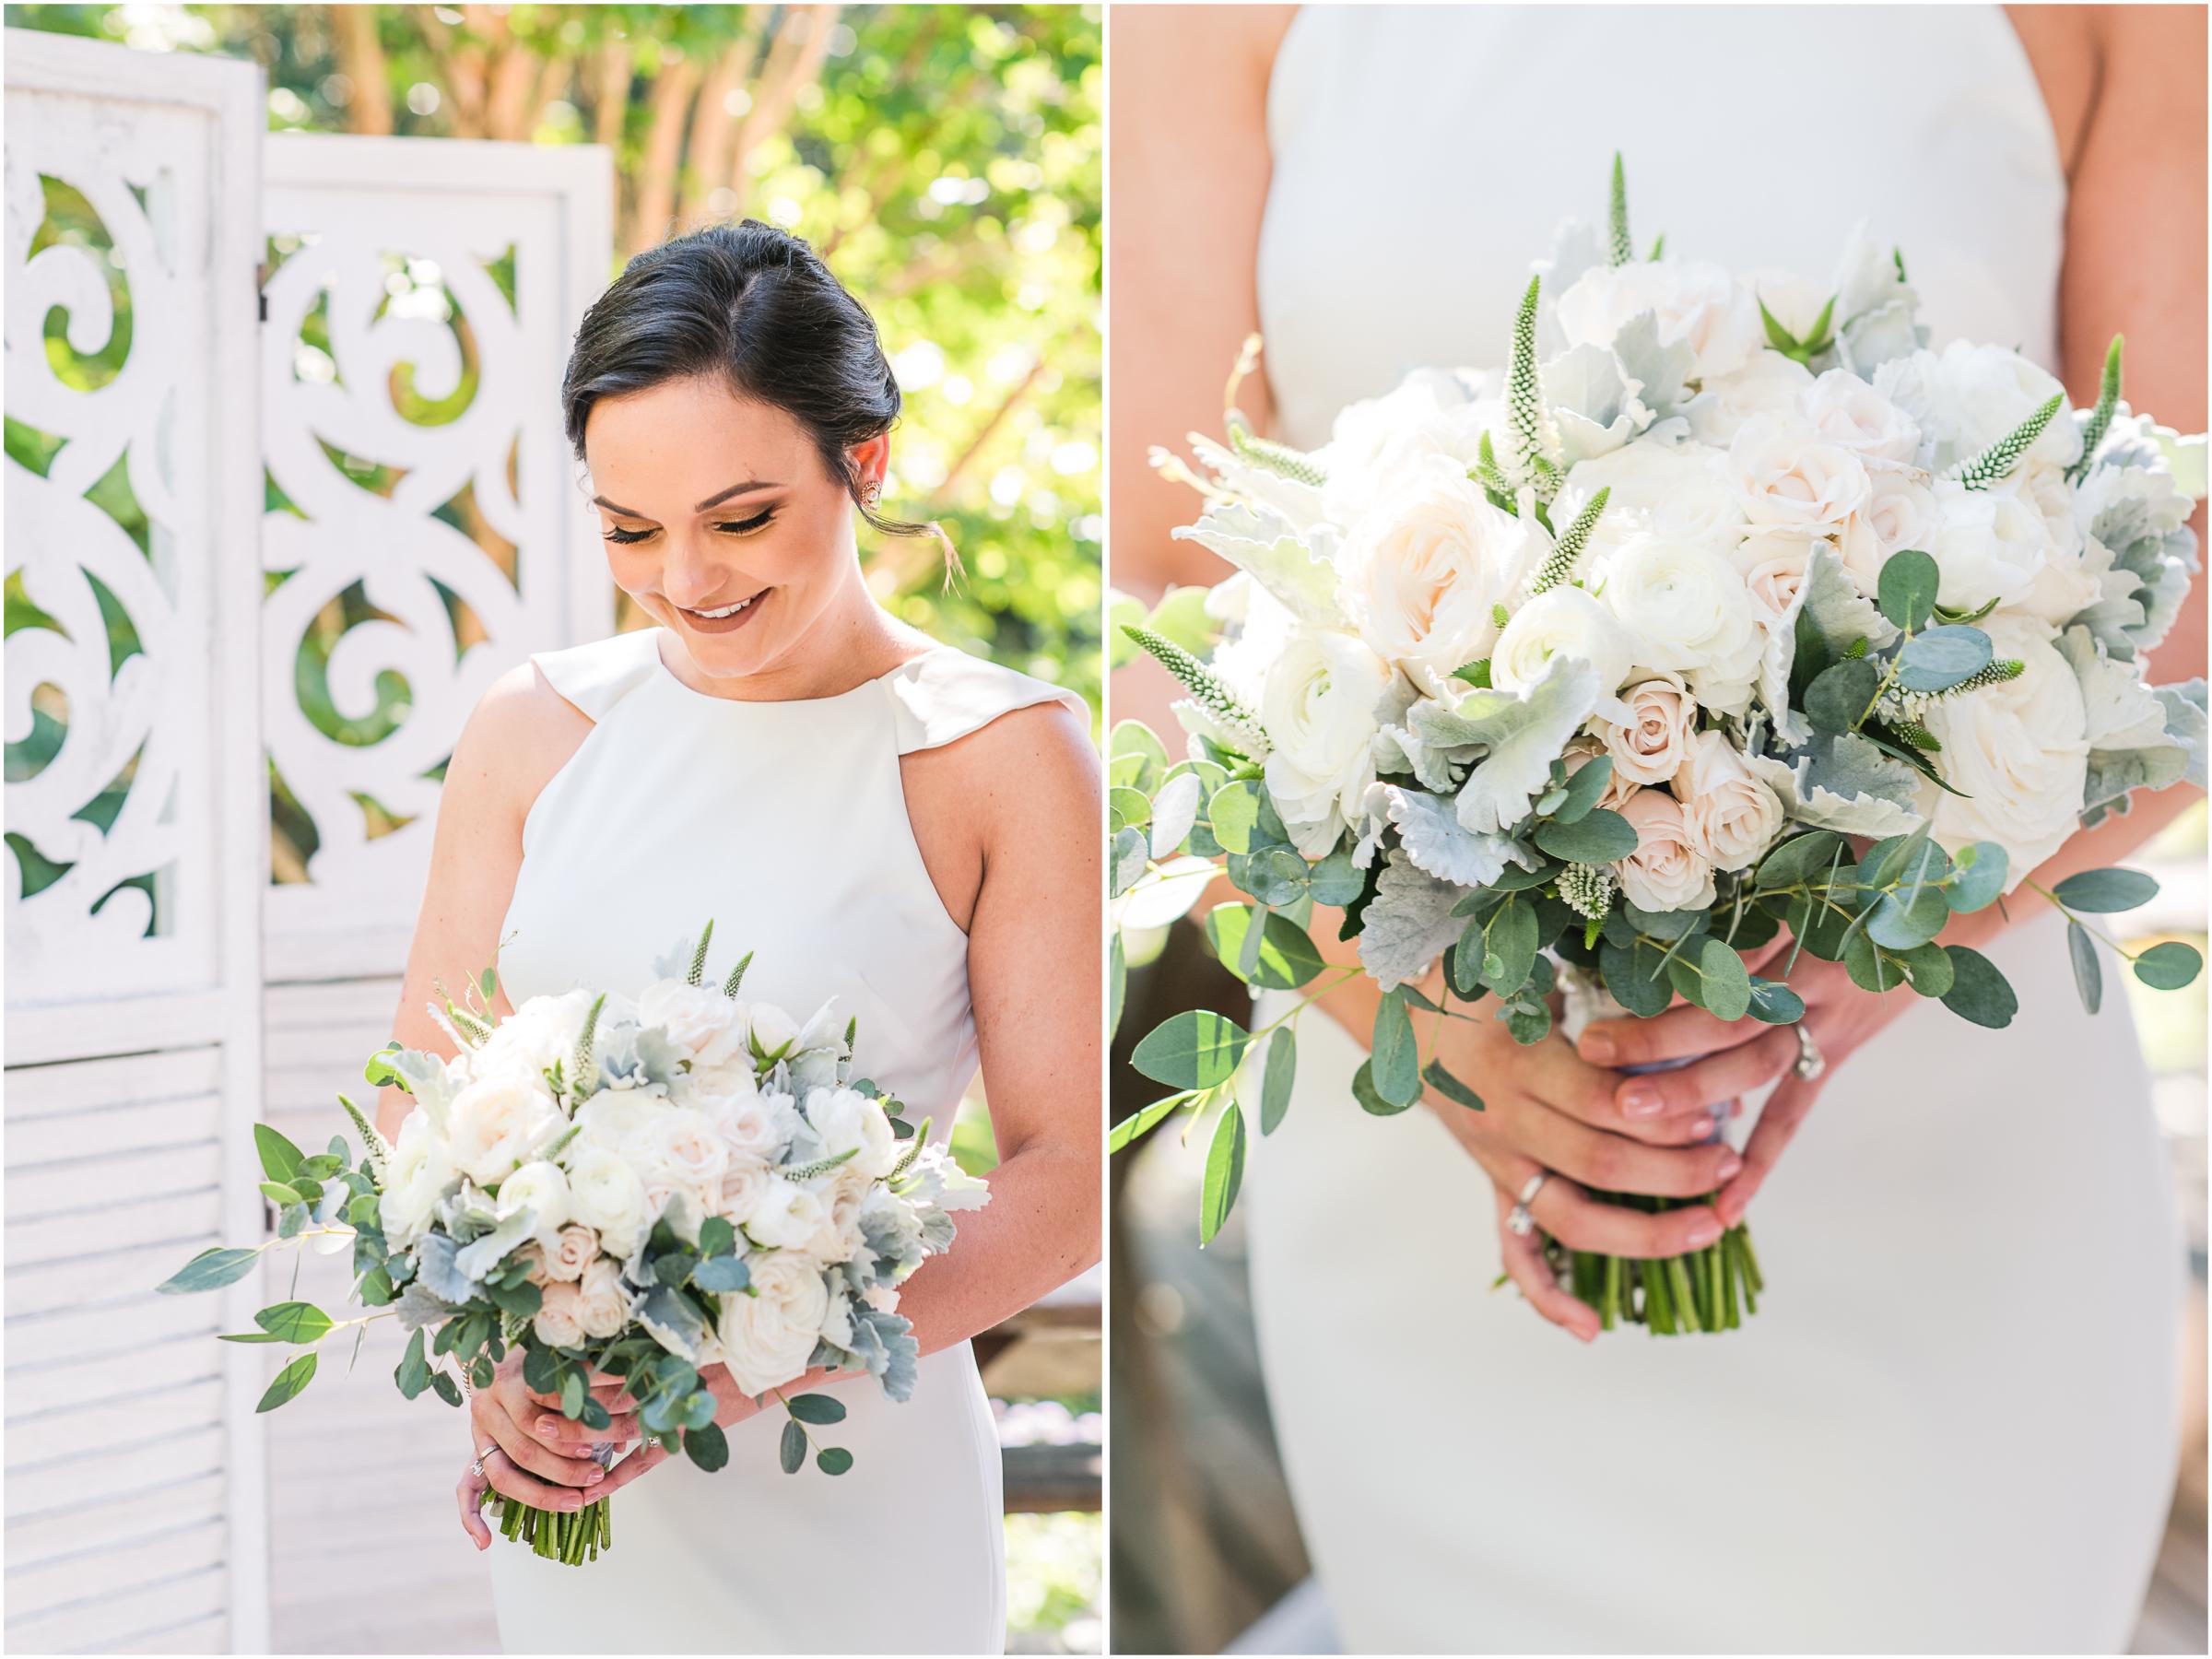 lbi-wedding-arts-foundation-lbi-wedding-photographer-18.jpg